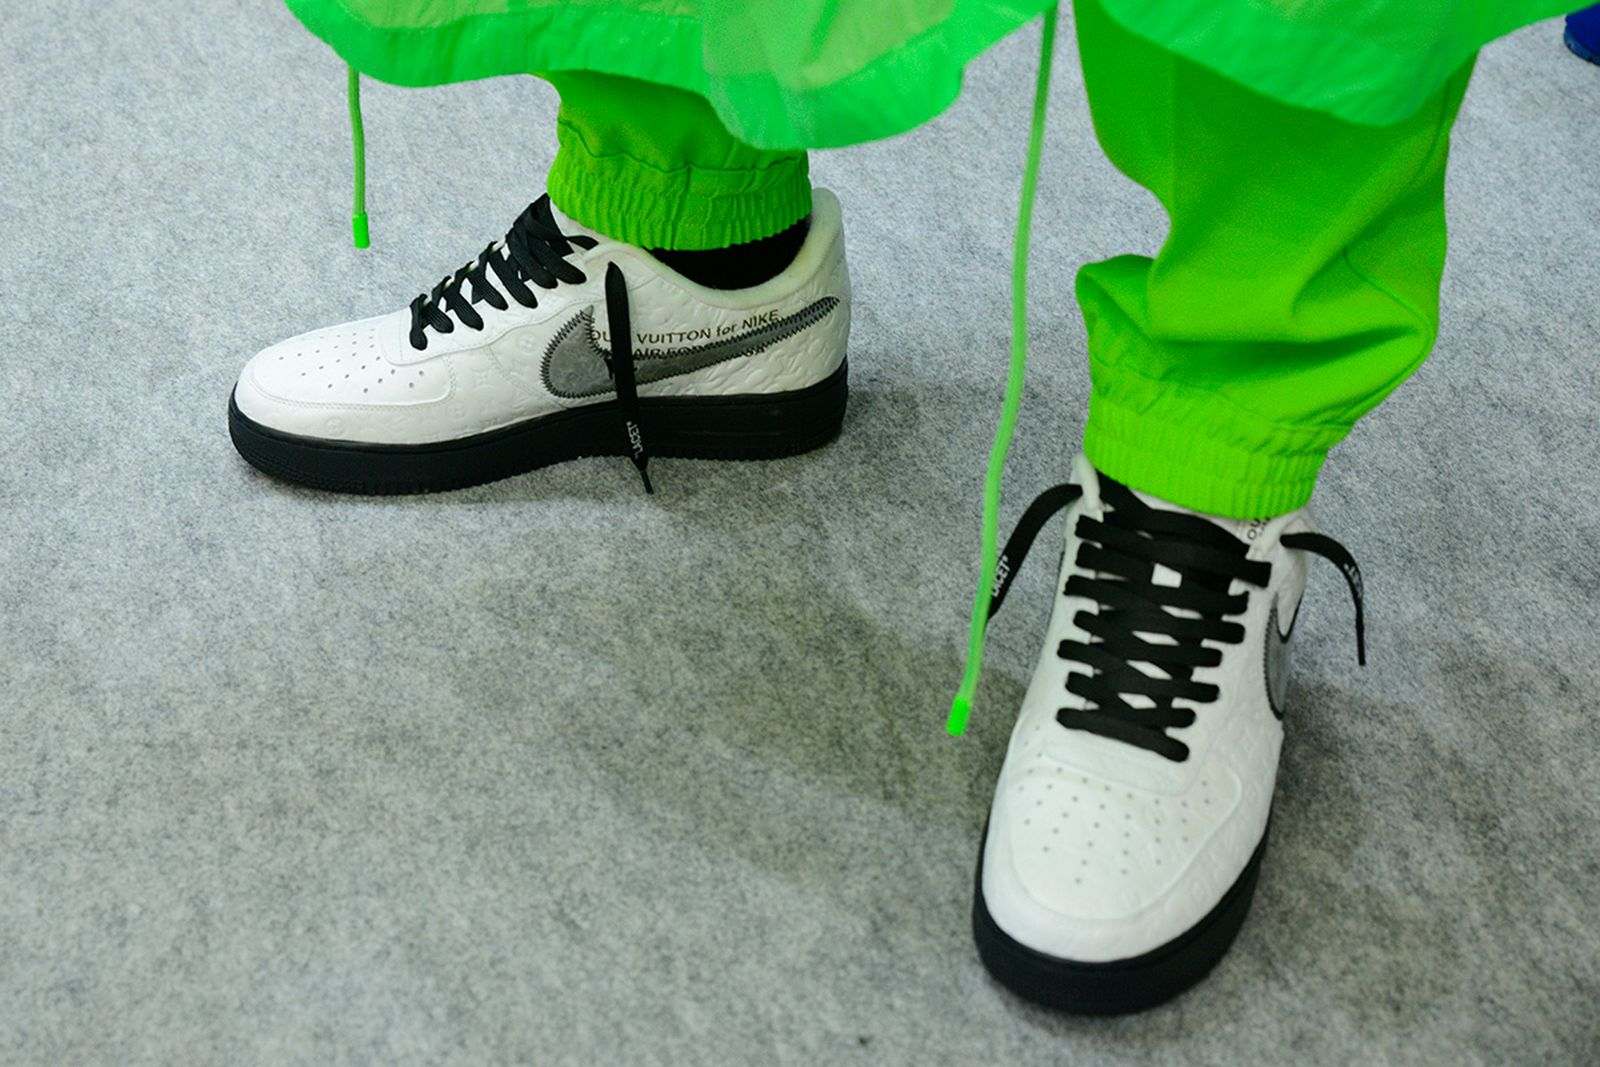 louis-vuitton-nike-virgil-abloh-sneaker-reveal-01